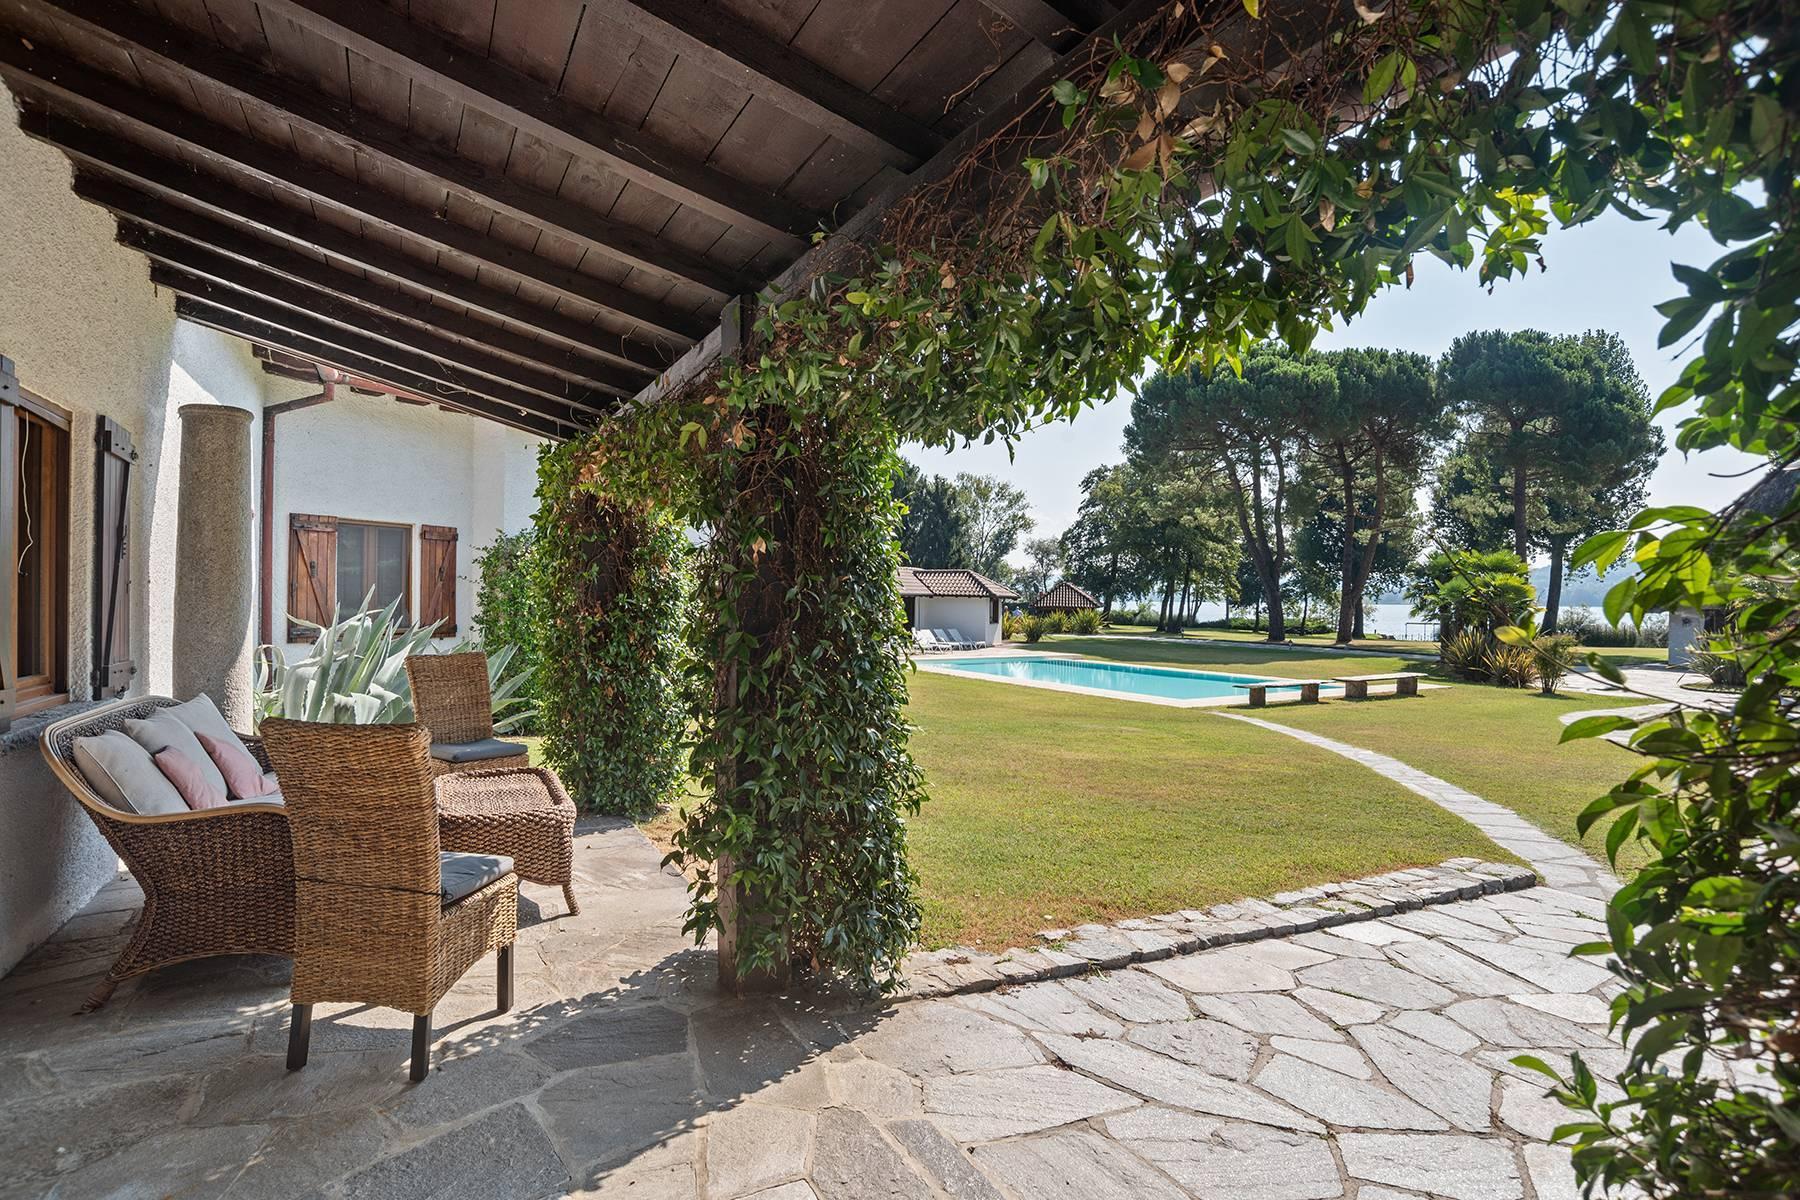 Charmante Villa in Lesa, mitten in der Natur - 16